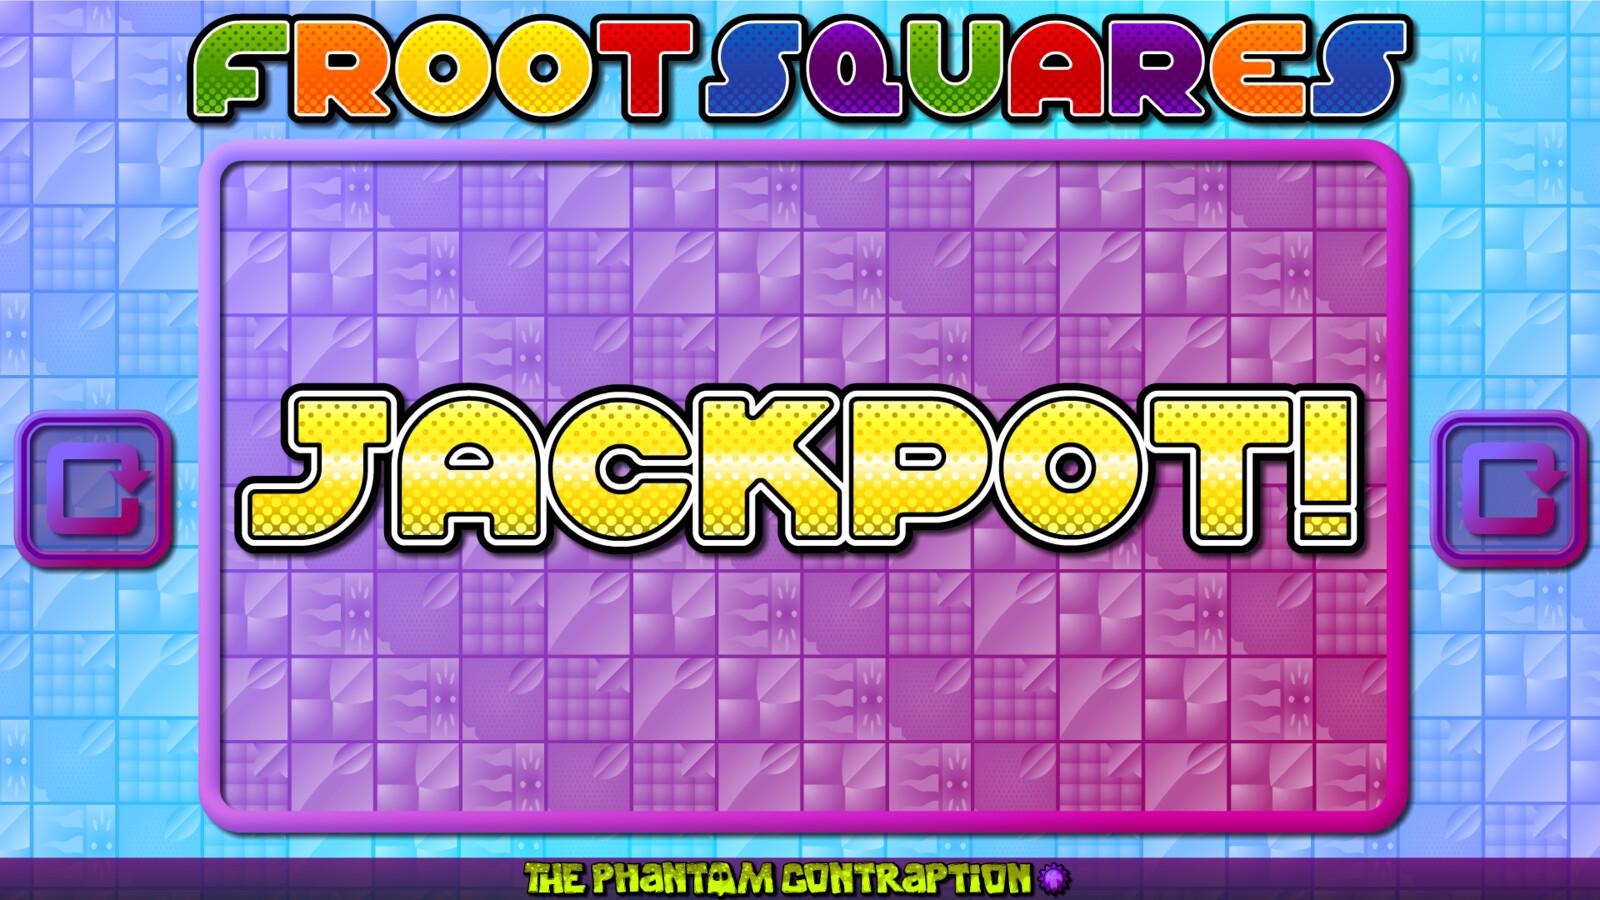 Froot Squares Landscape Screenshot: Jackpot Screen